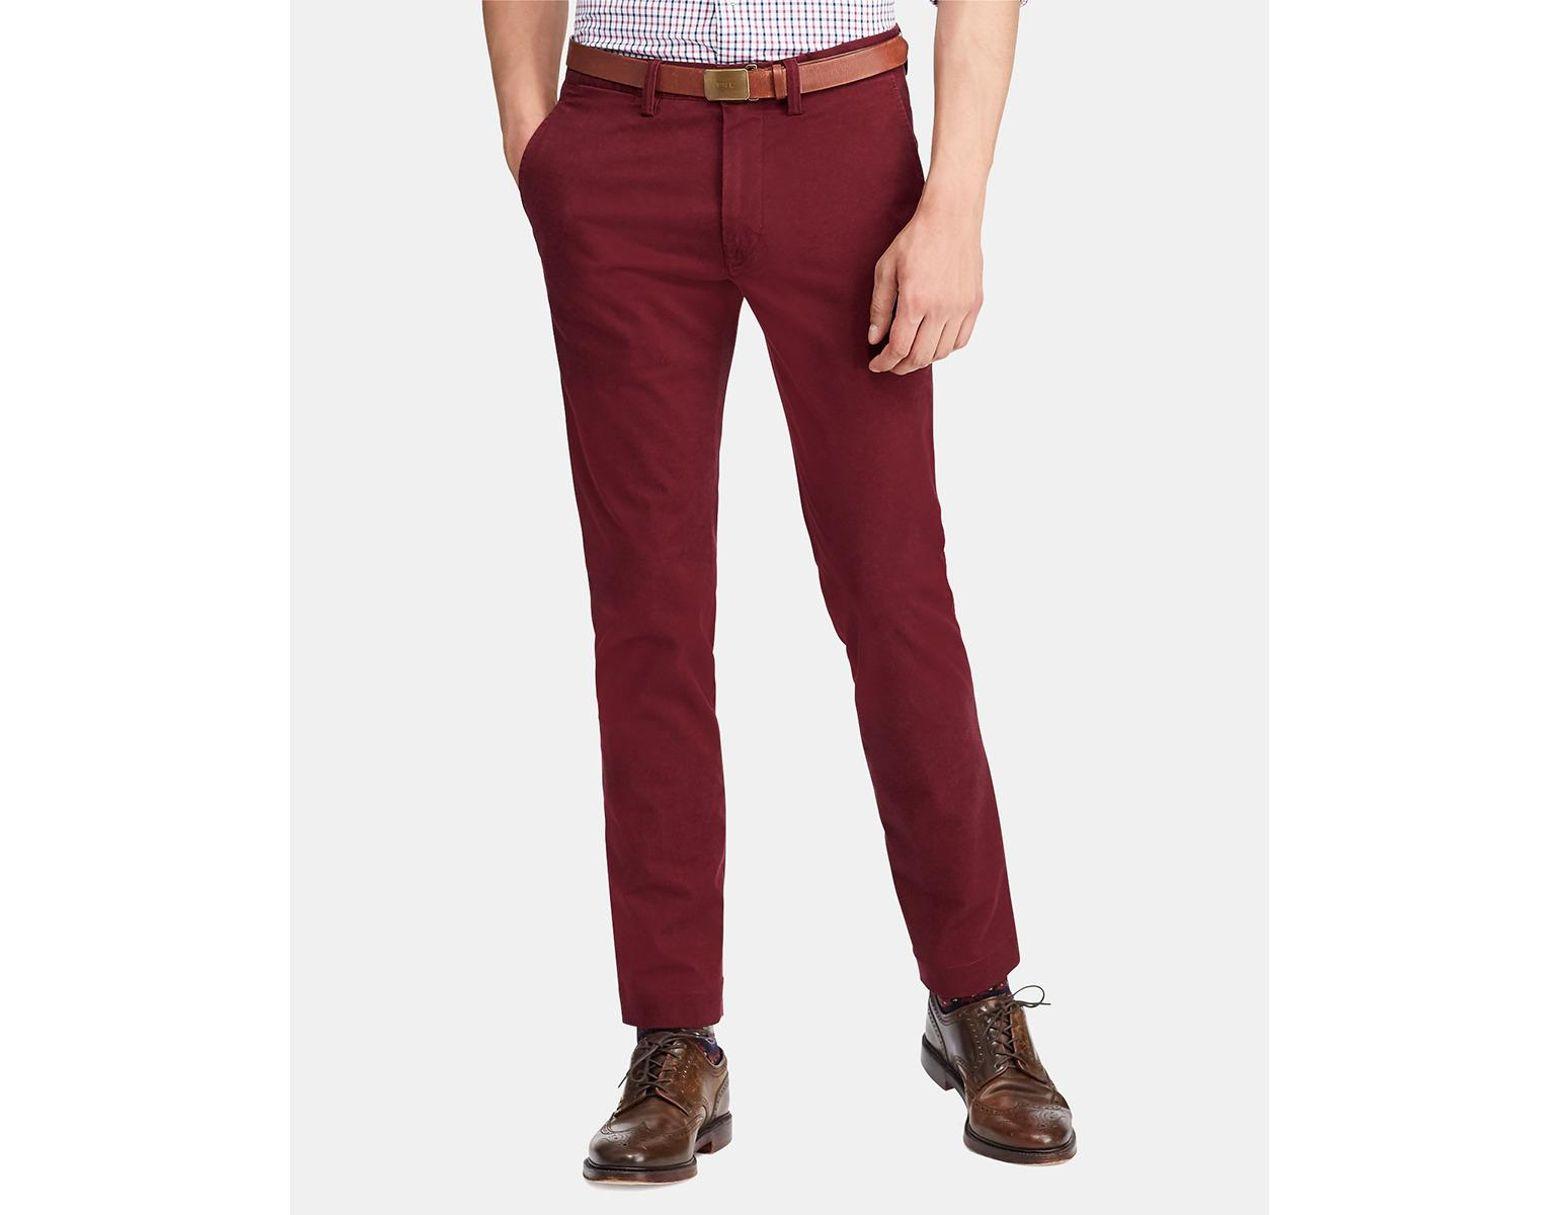 Slim Red Chinos Men's Fit Maroon qzSUVMp